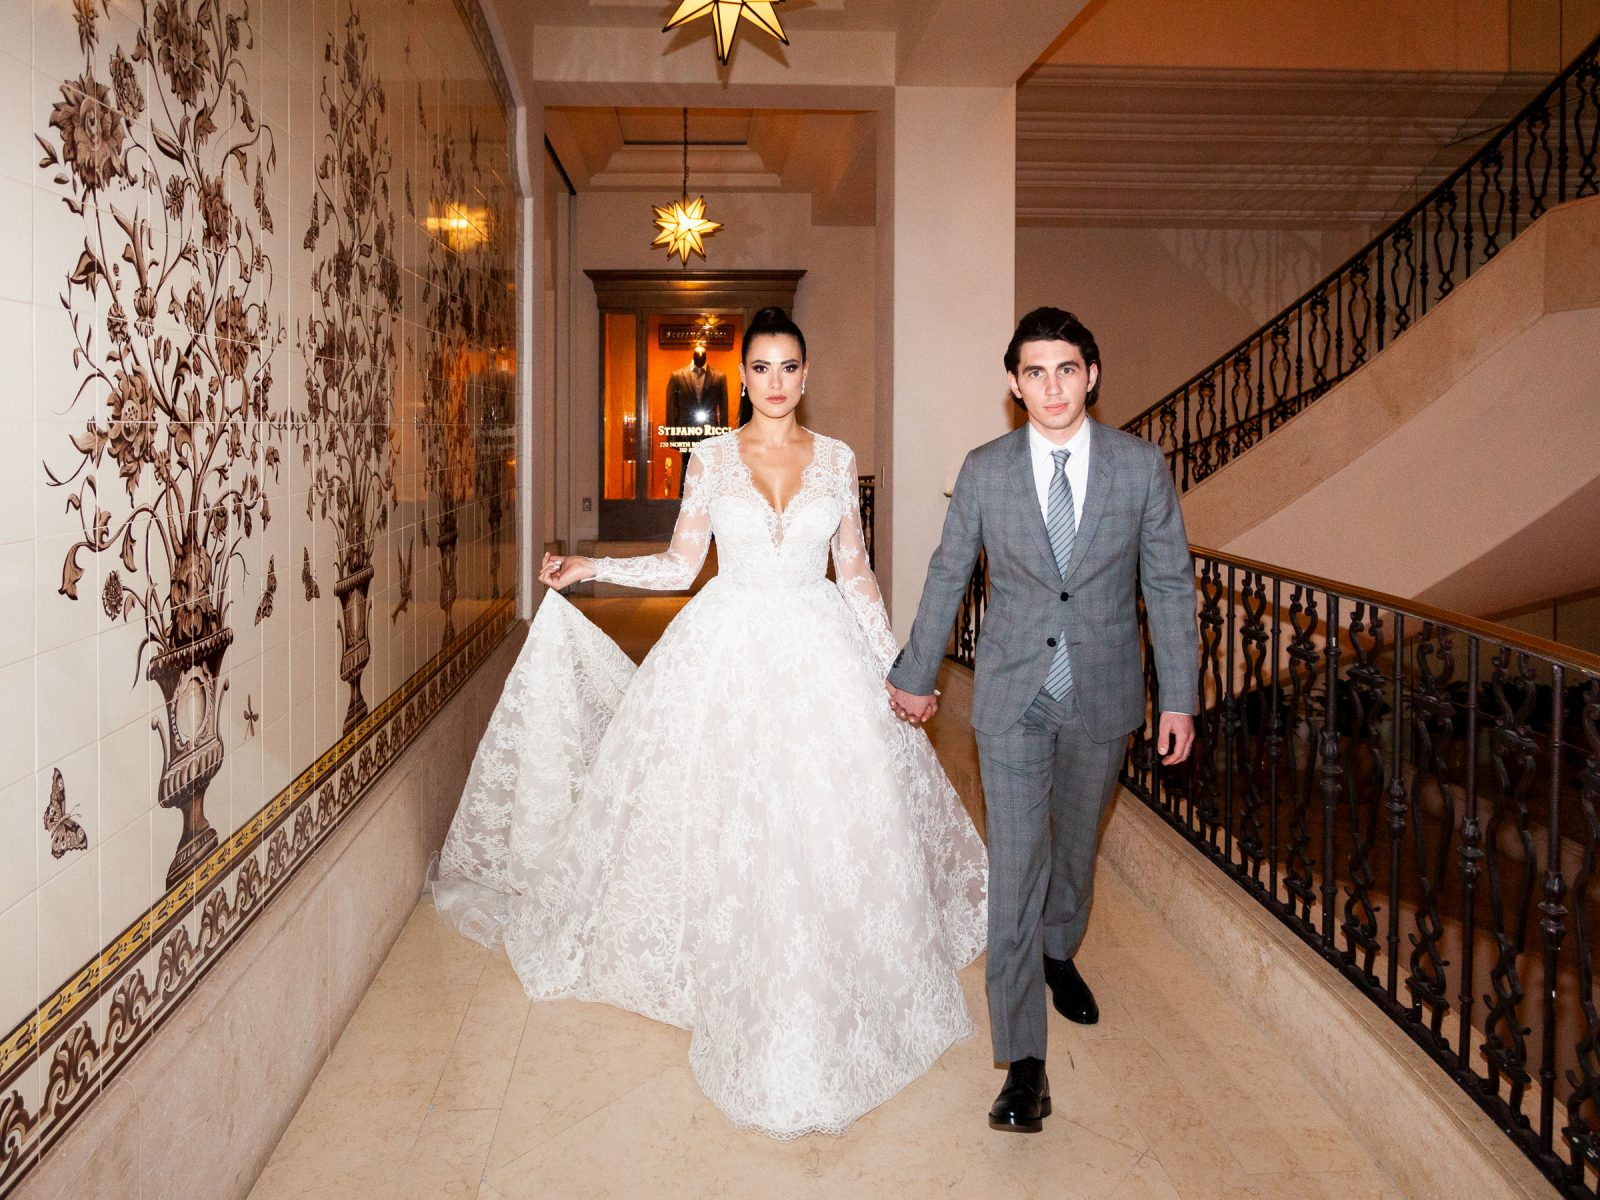 maria-eduardo-montage-beverly-hills-wedding-199.jpg